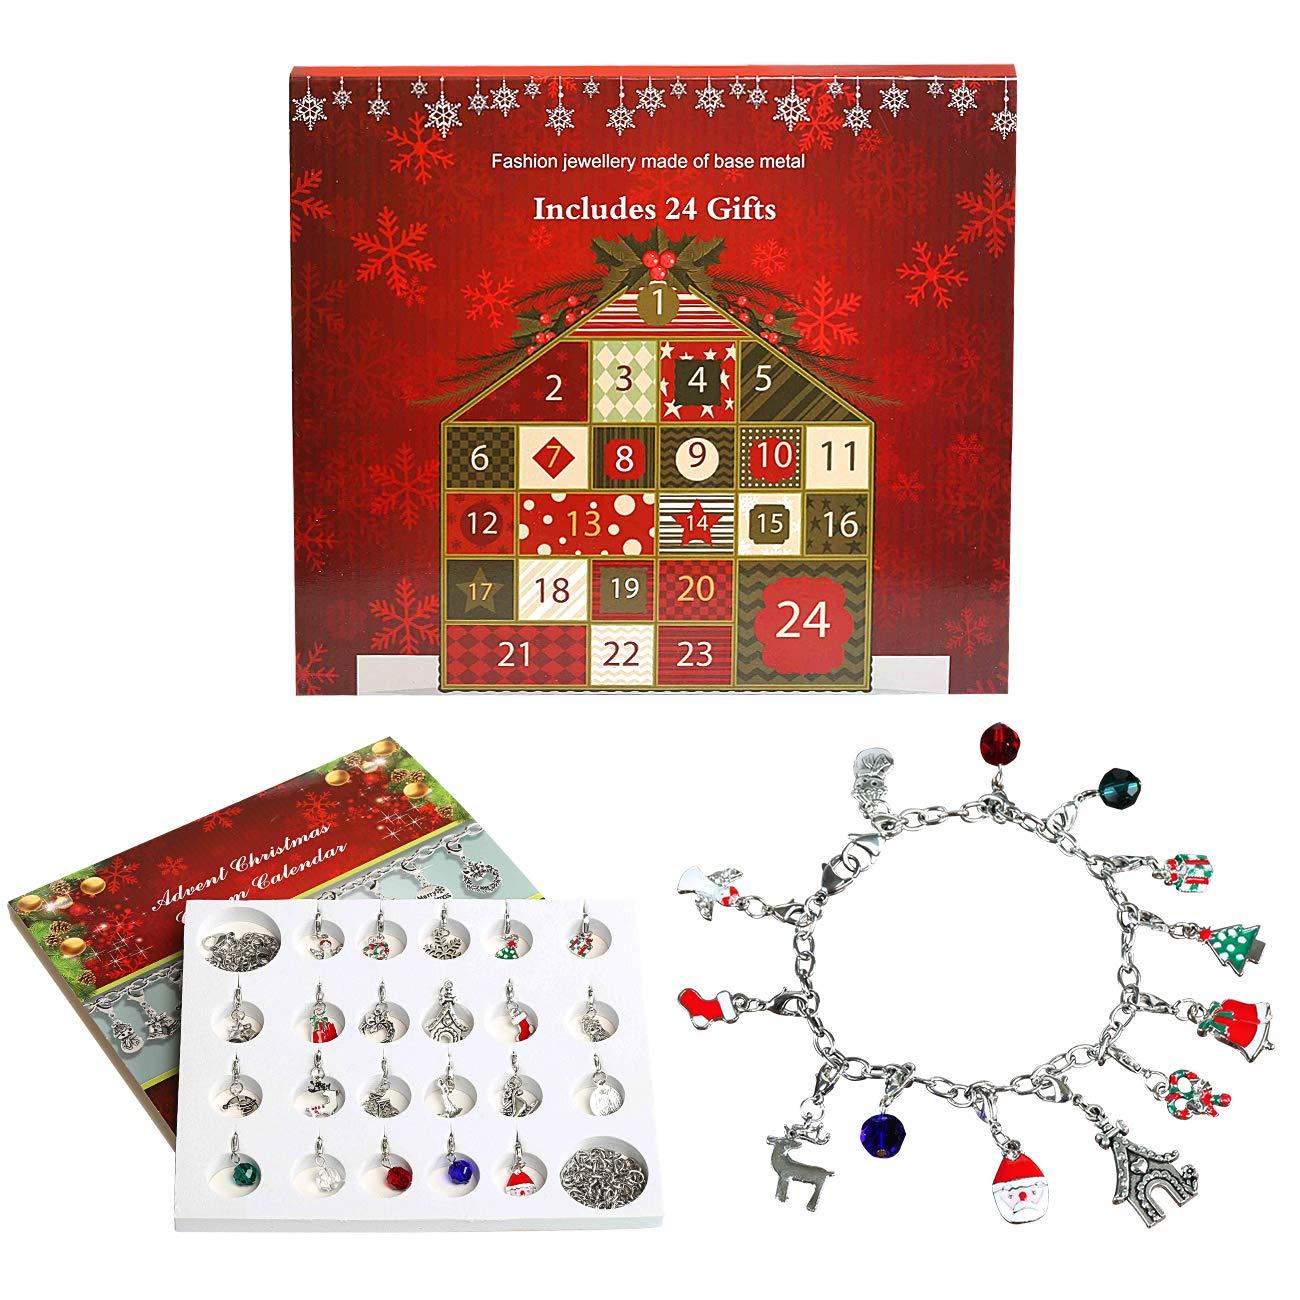 Naler Advent Calendar Charm Bracelet Necklace DIY 22 Charms Set Fashion Jewelry Advent Calendars for Kids Christmas Toy